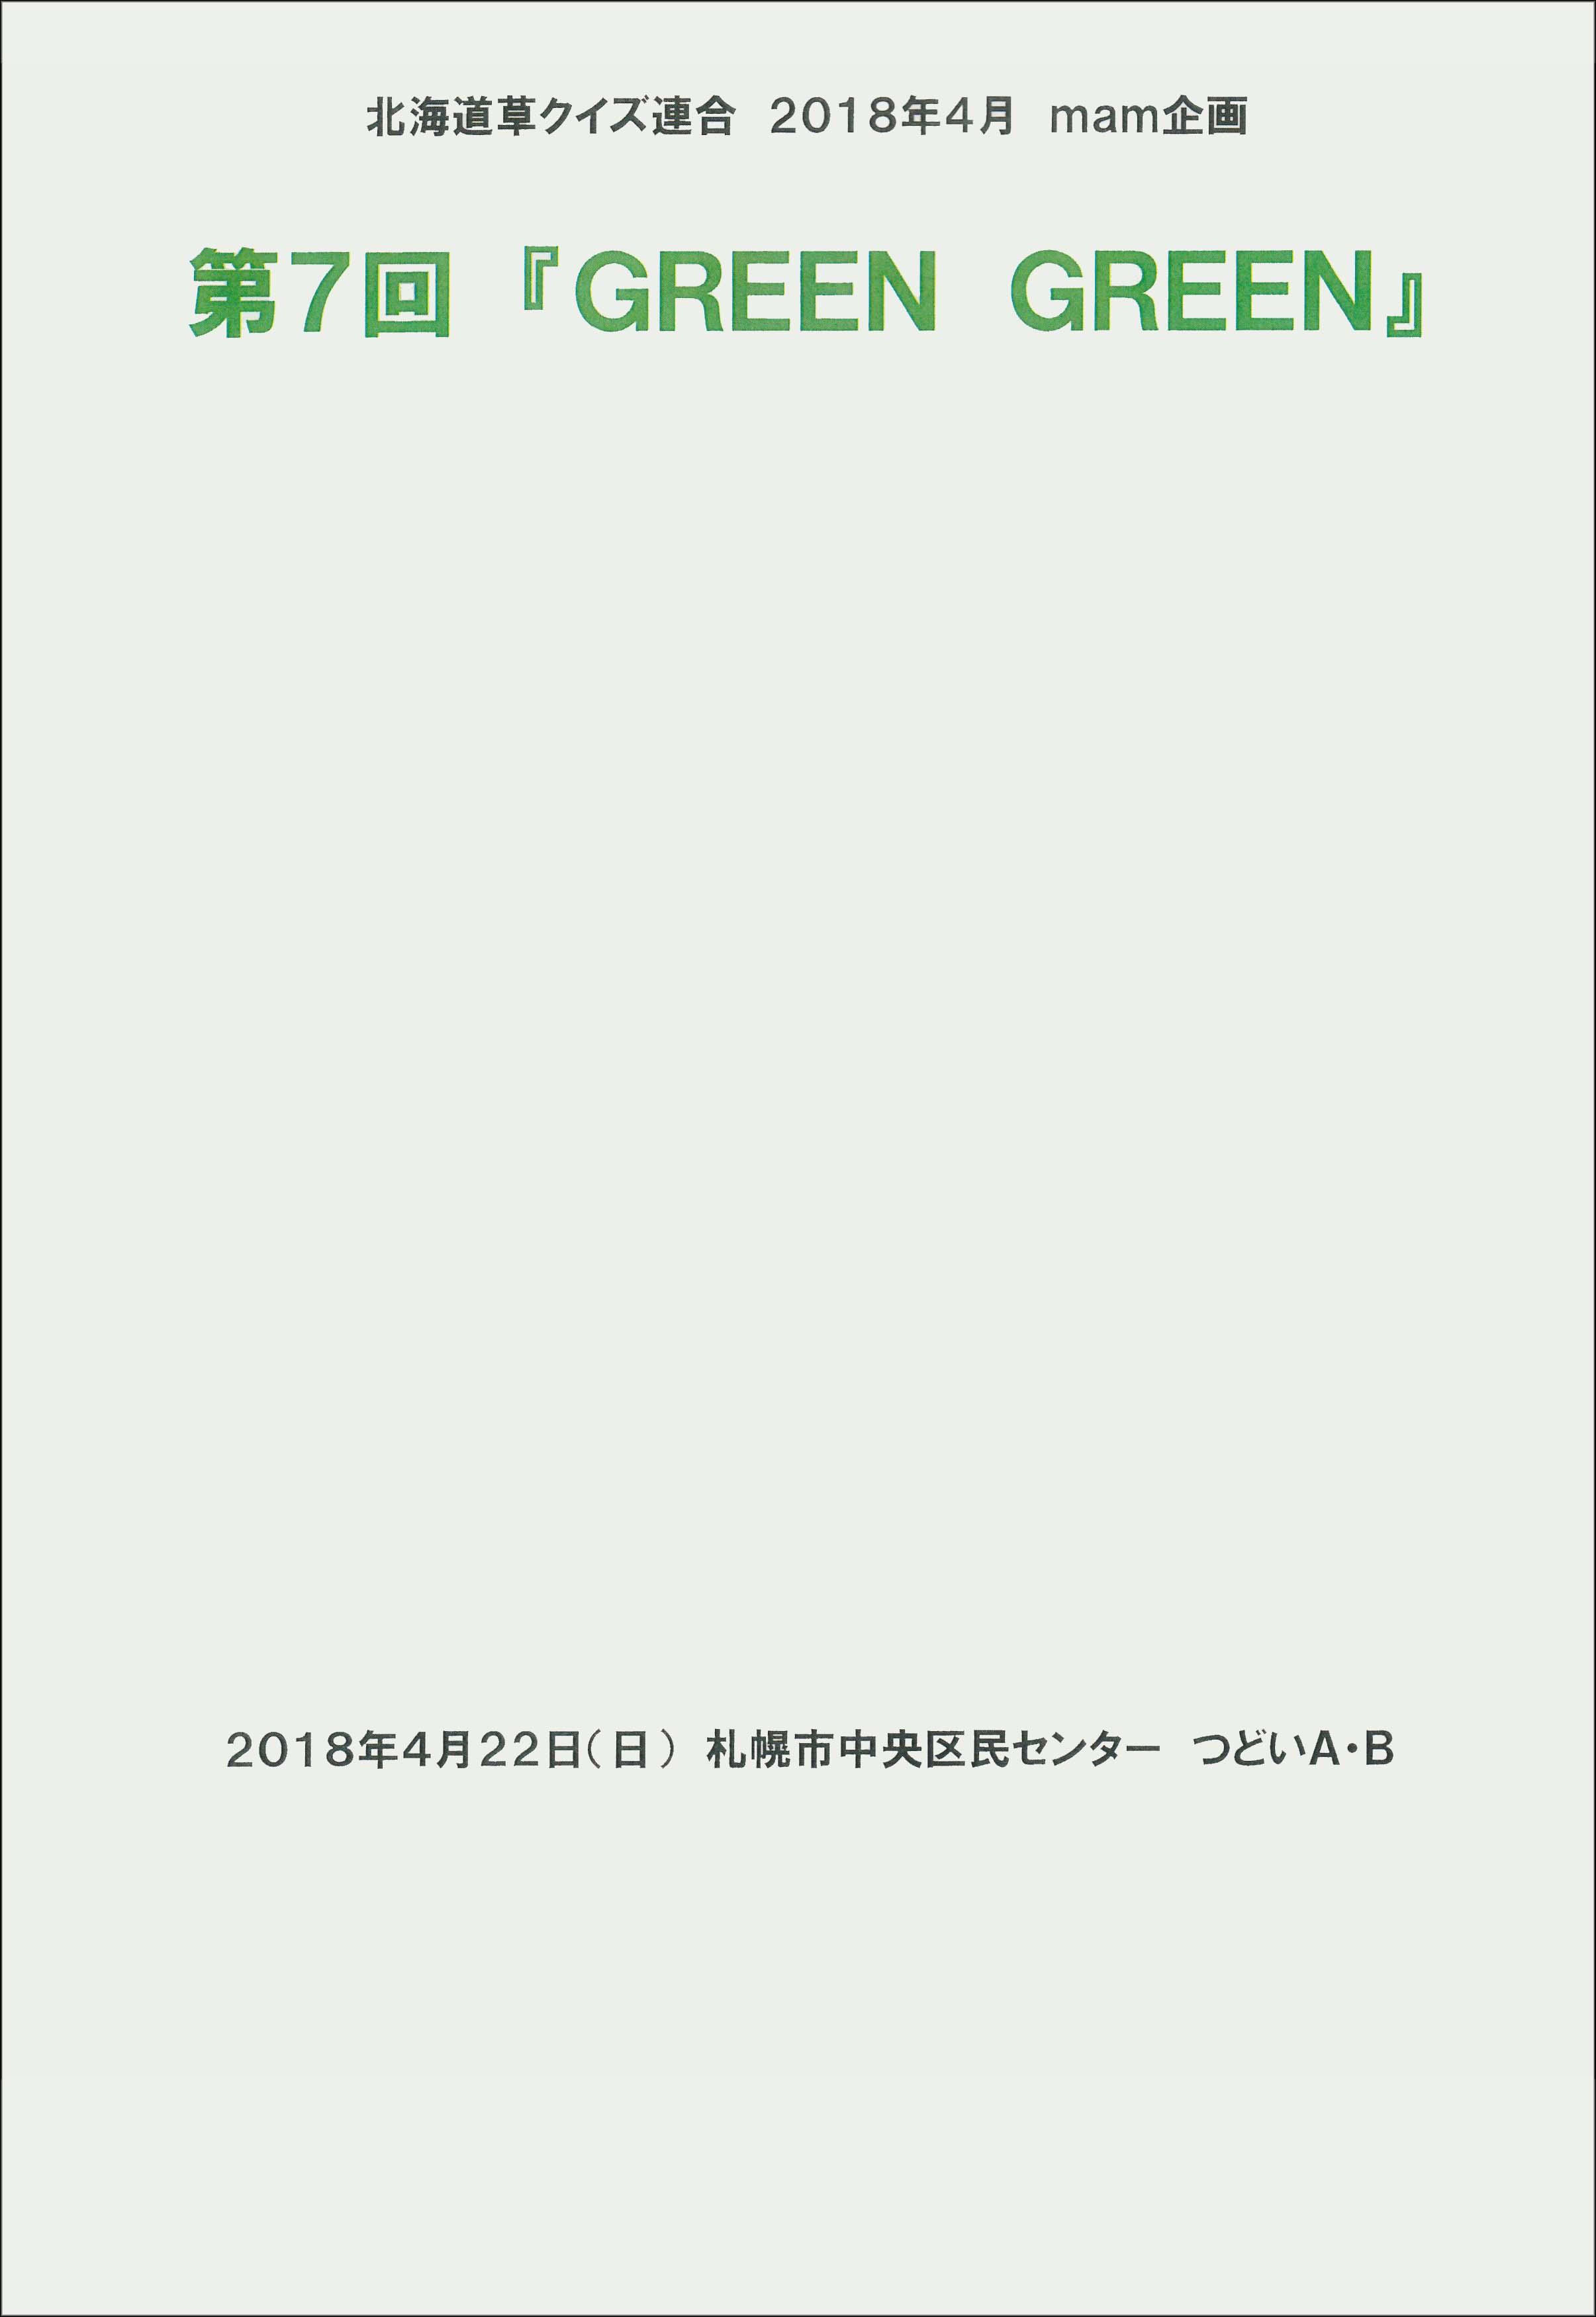 C11111315